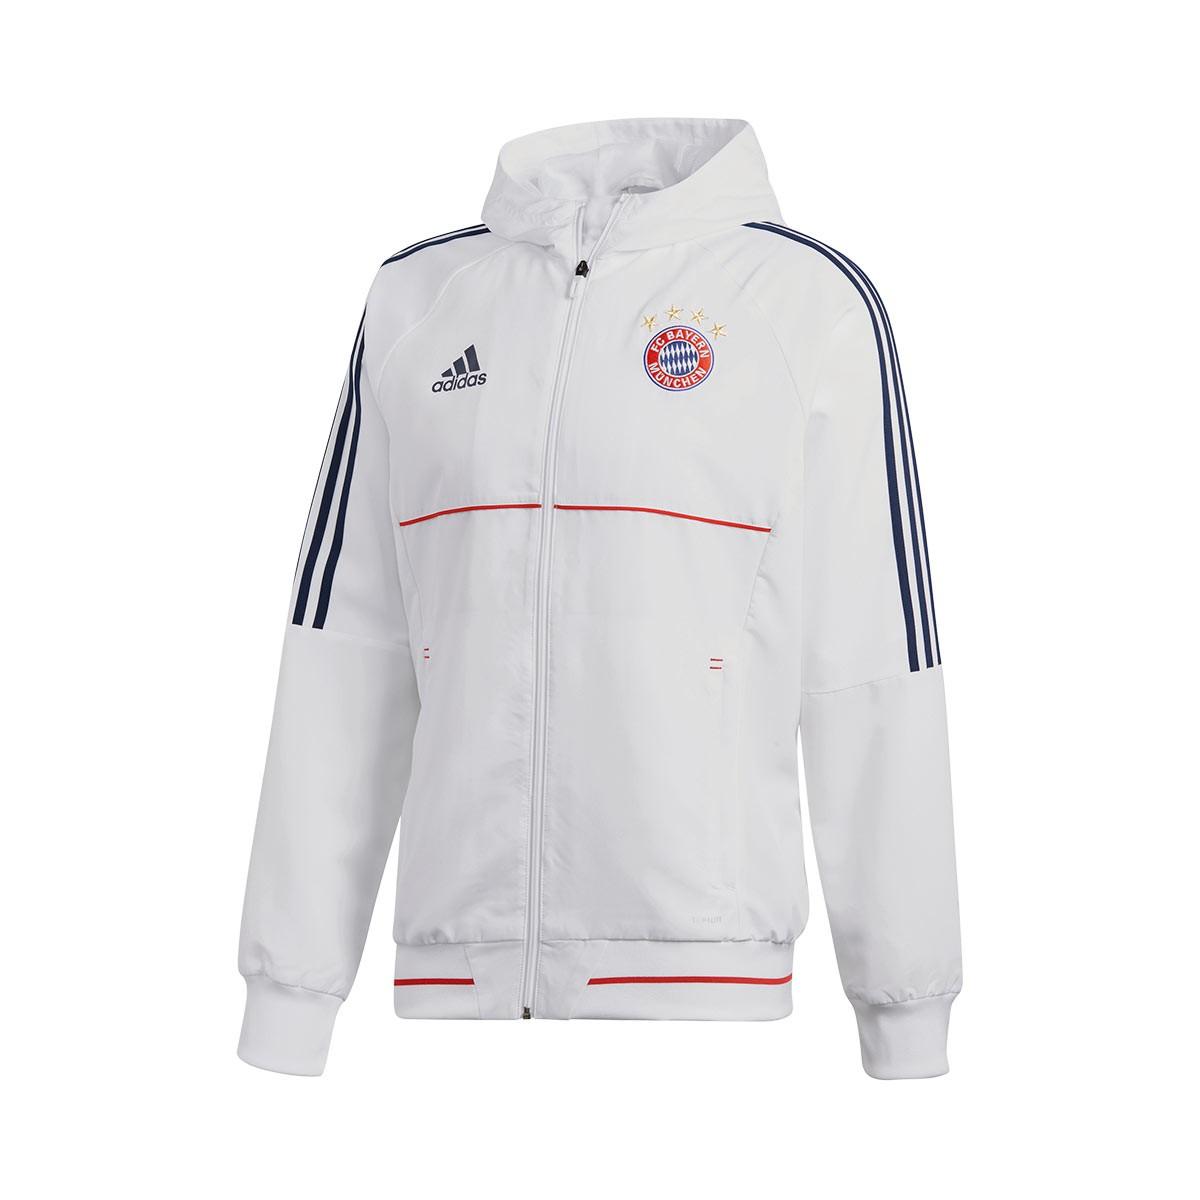 a946bd51087 Casaco adidas FC Bayern Munich Pre-Match 2017-2018 White-Collegiate navy -  Loja de futebol Fútbol Emotion